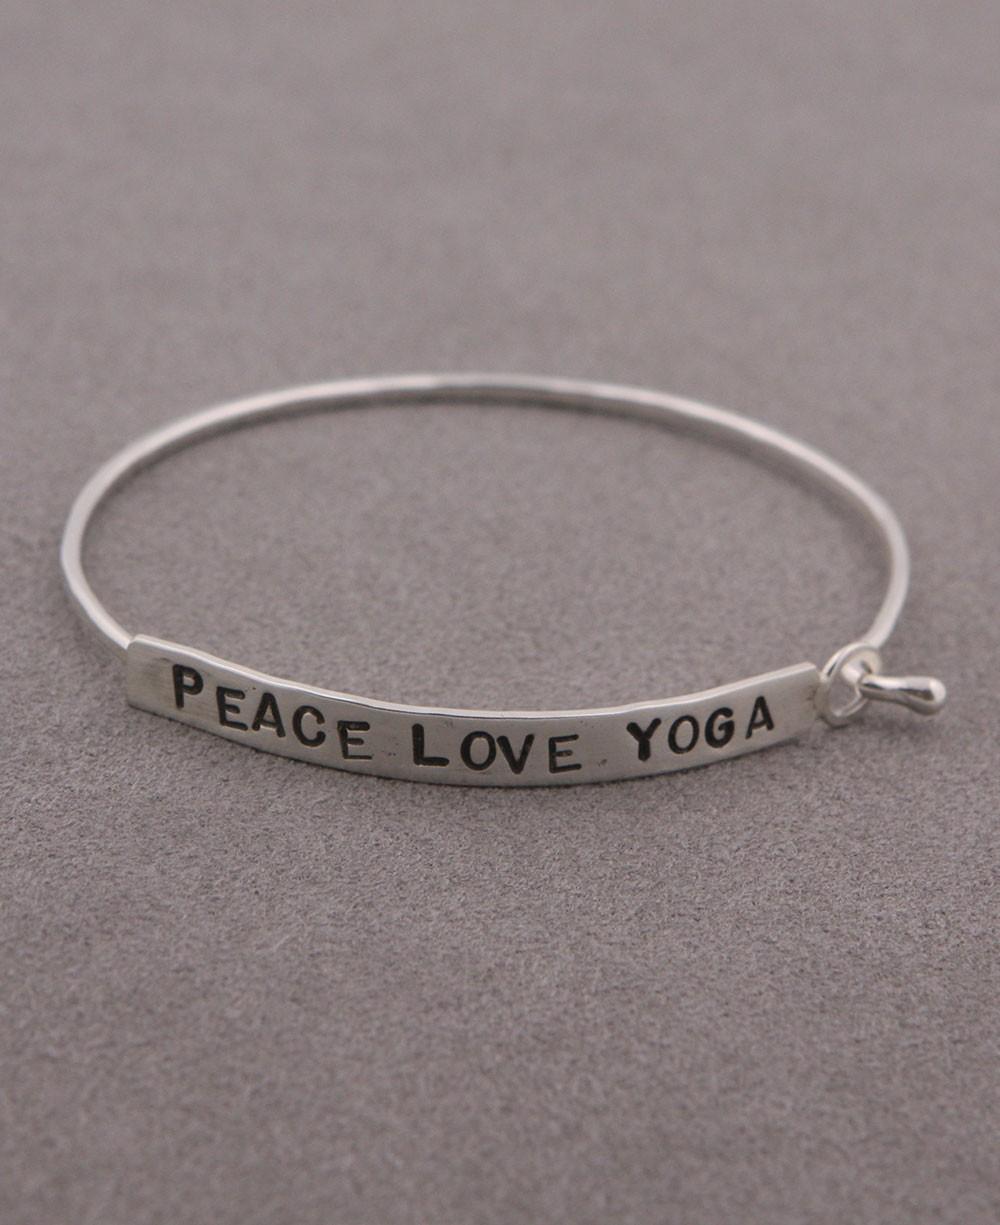 Inspirational Jewelry, Peace Love Yoga Bracelet, Silver